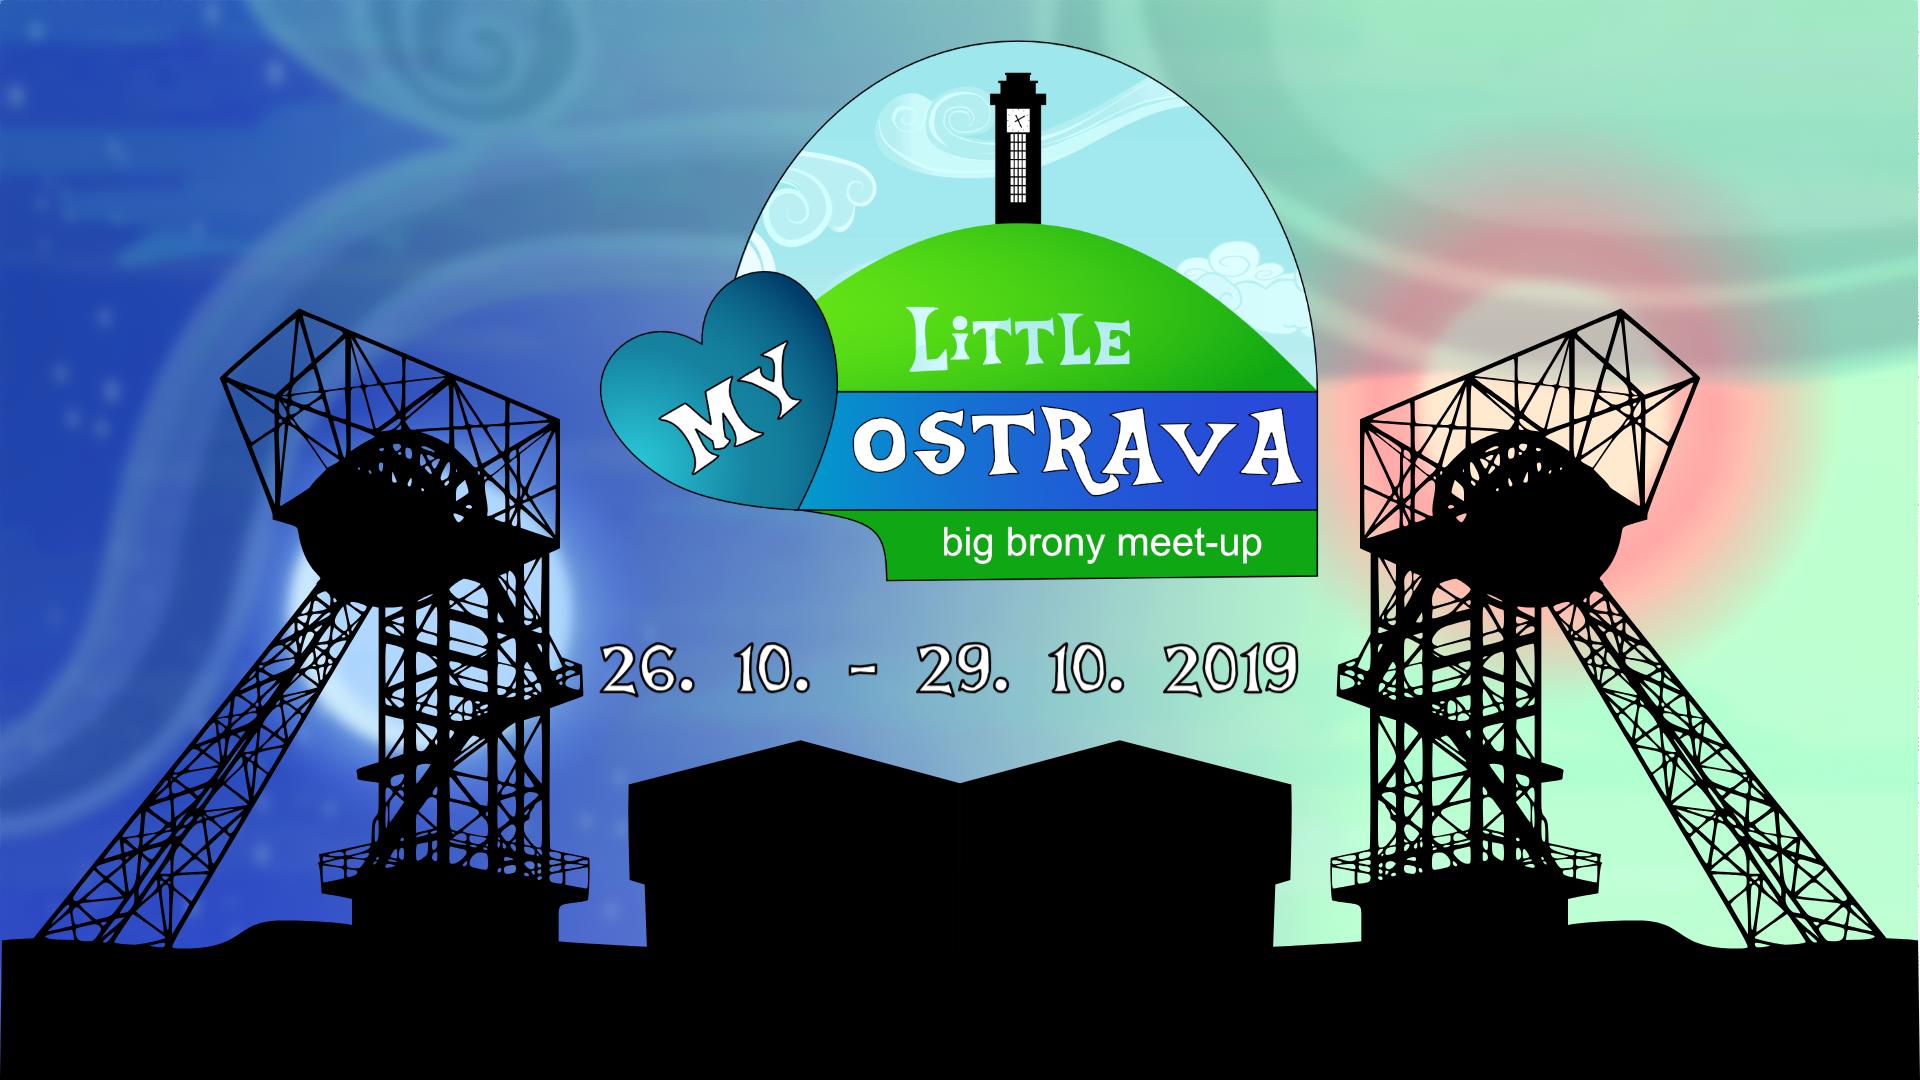 [Obrázek: My_Little_Ostrava_2019_Promo_Image.png]